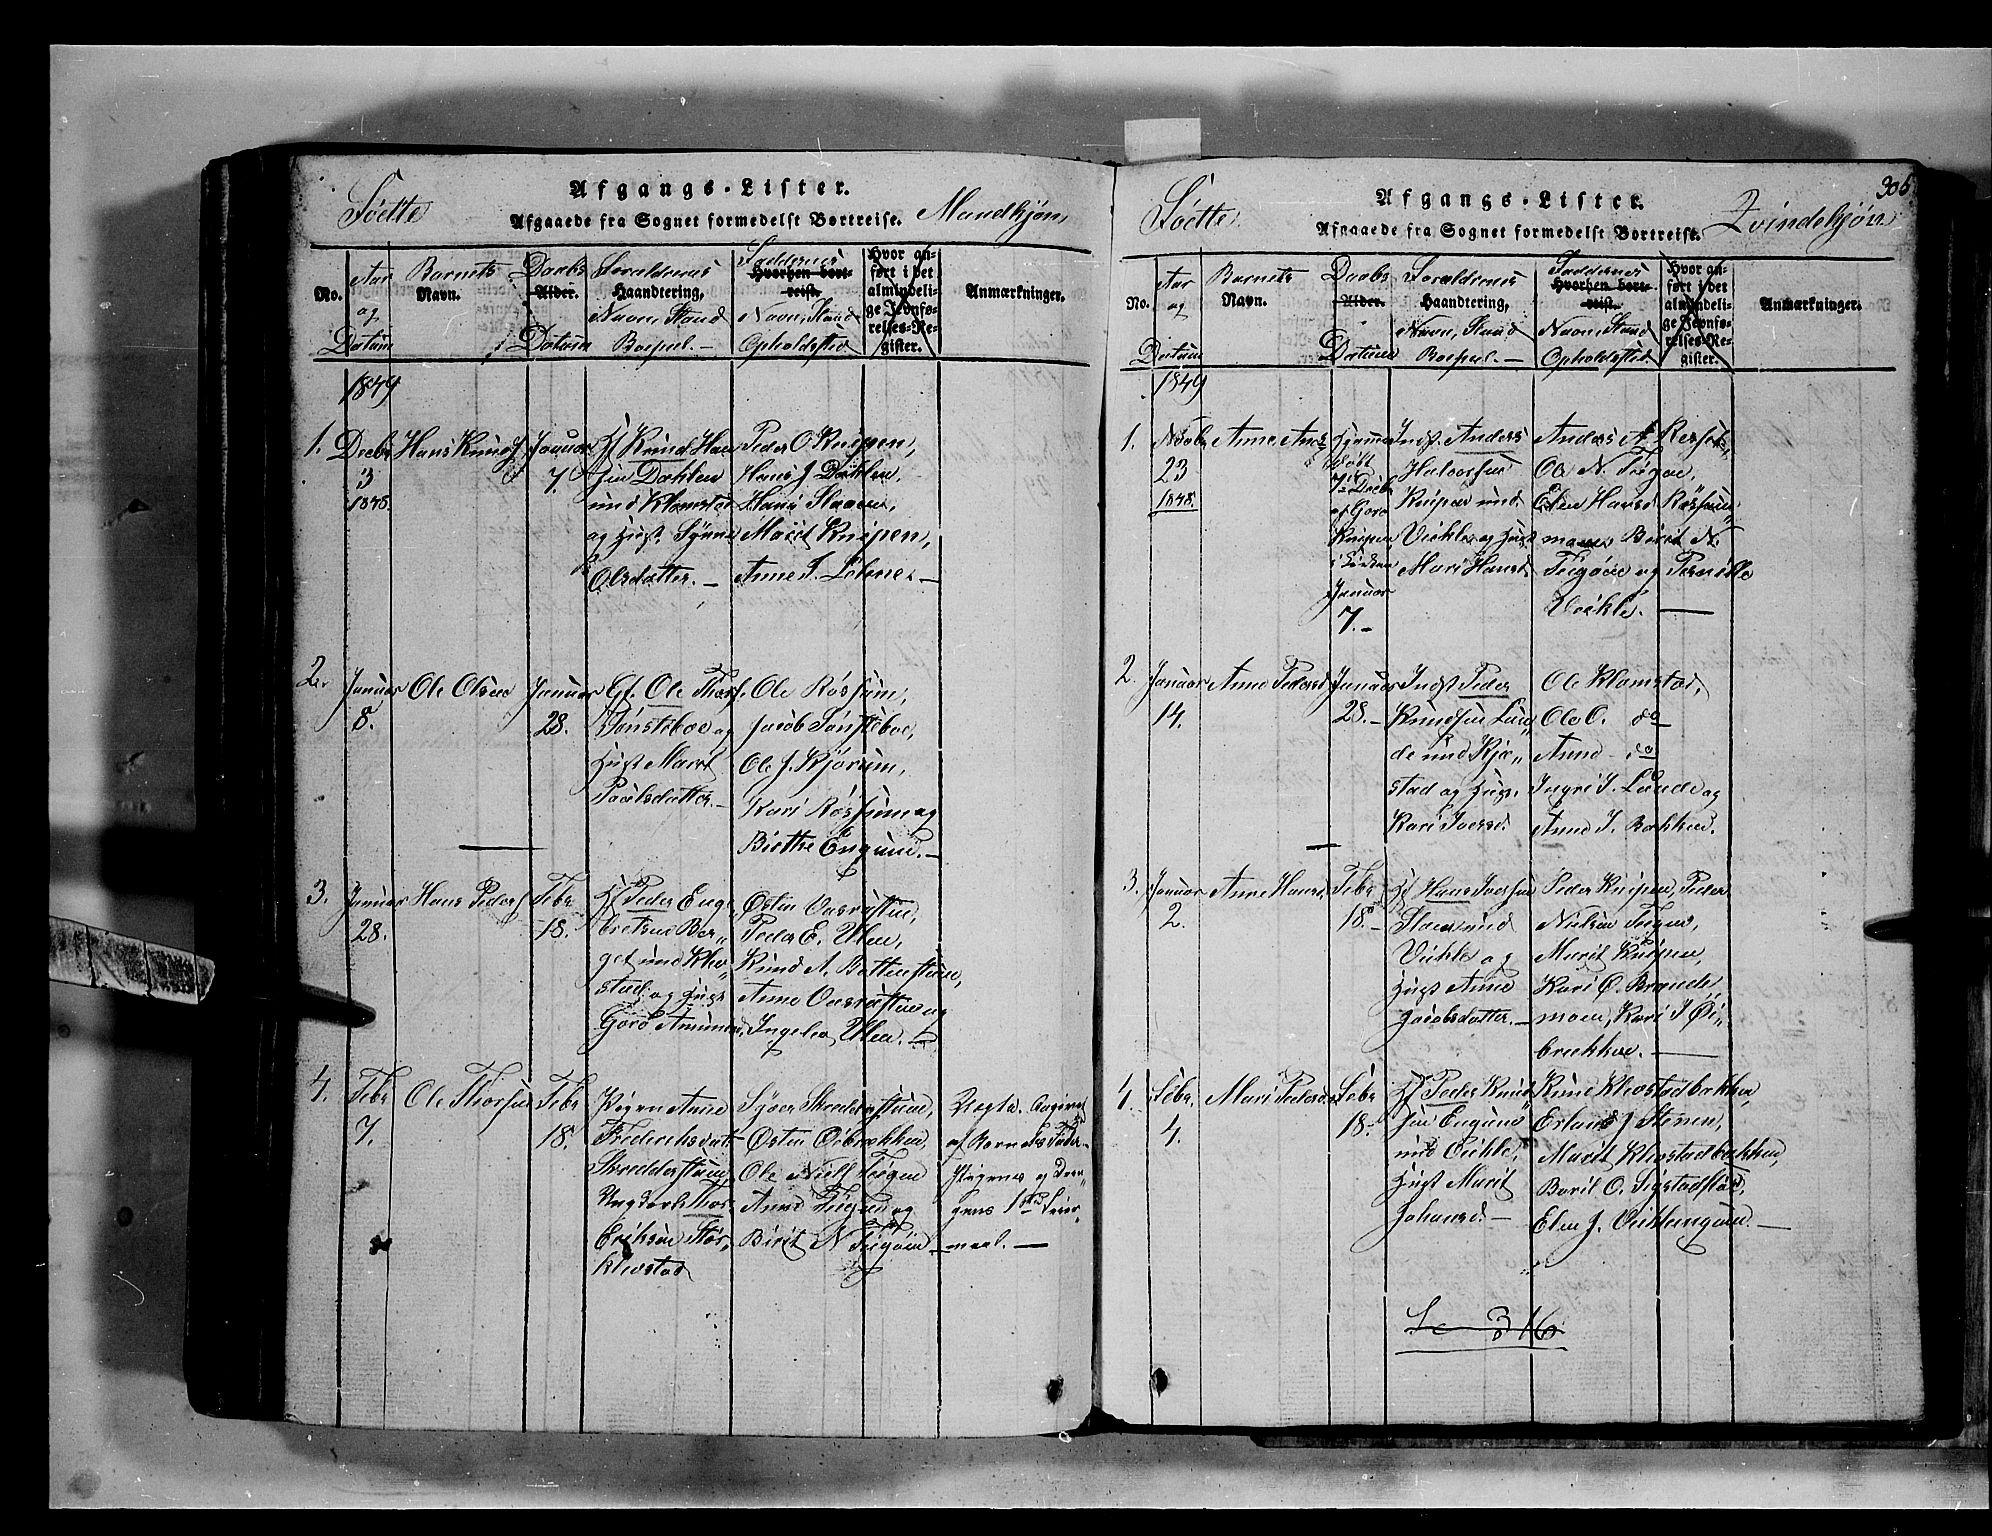 SAH, Fron prestekontor, H/Ha/Hab/L0002: Klokkerbok nr. 2, 1816-1850, s. 305